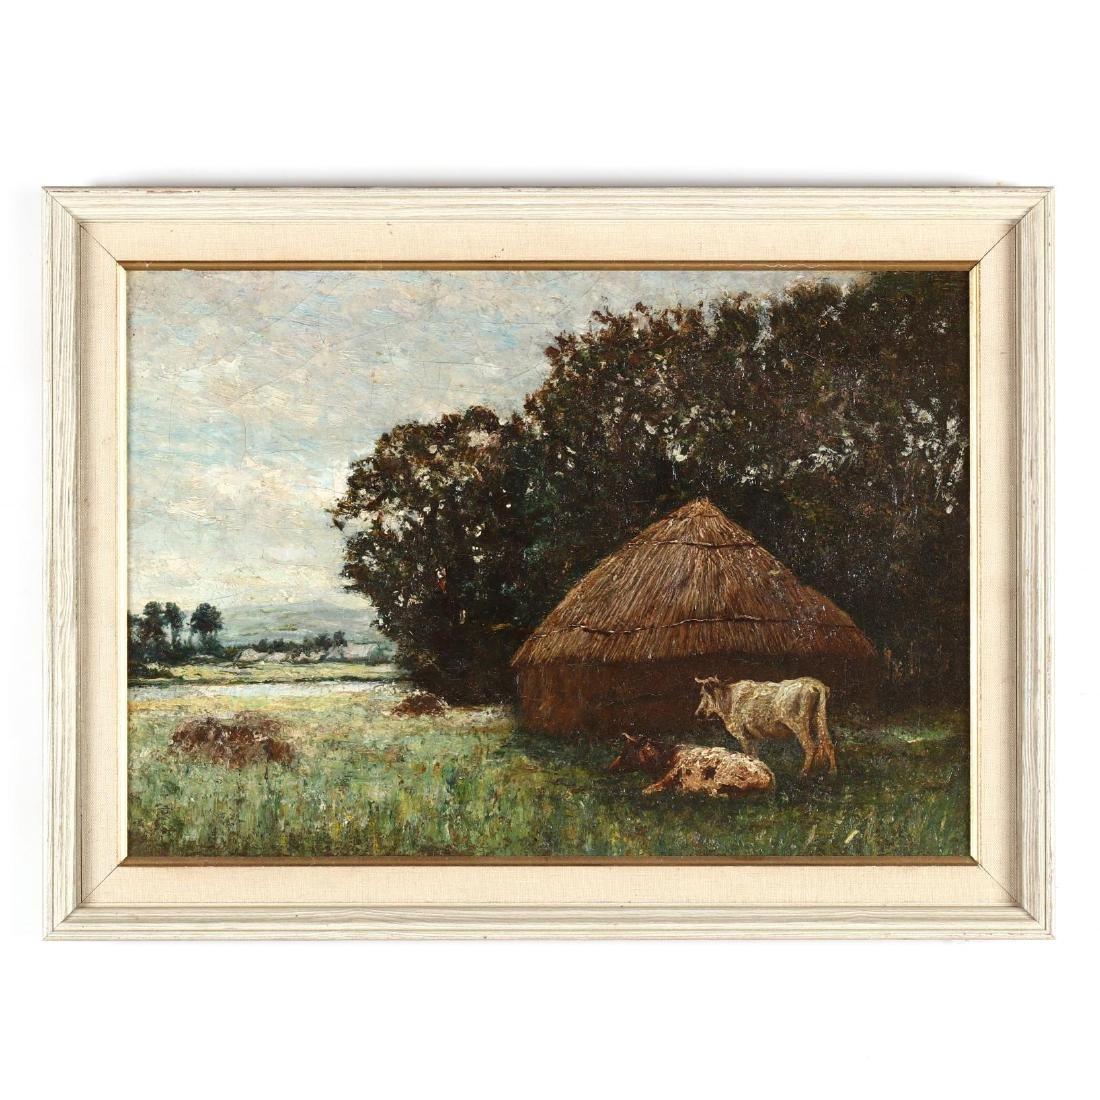 Willem Cornelis Rip (Dutch, 1856-1922), Polder